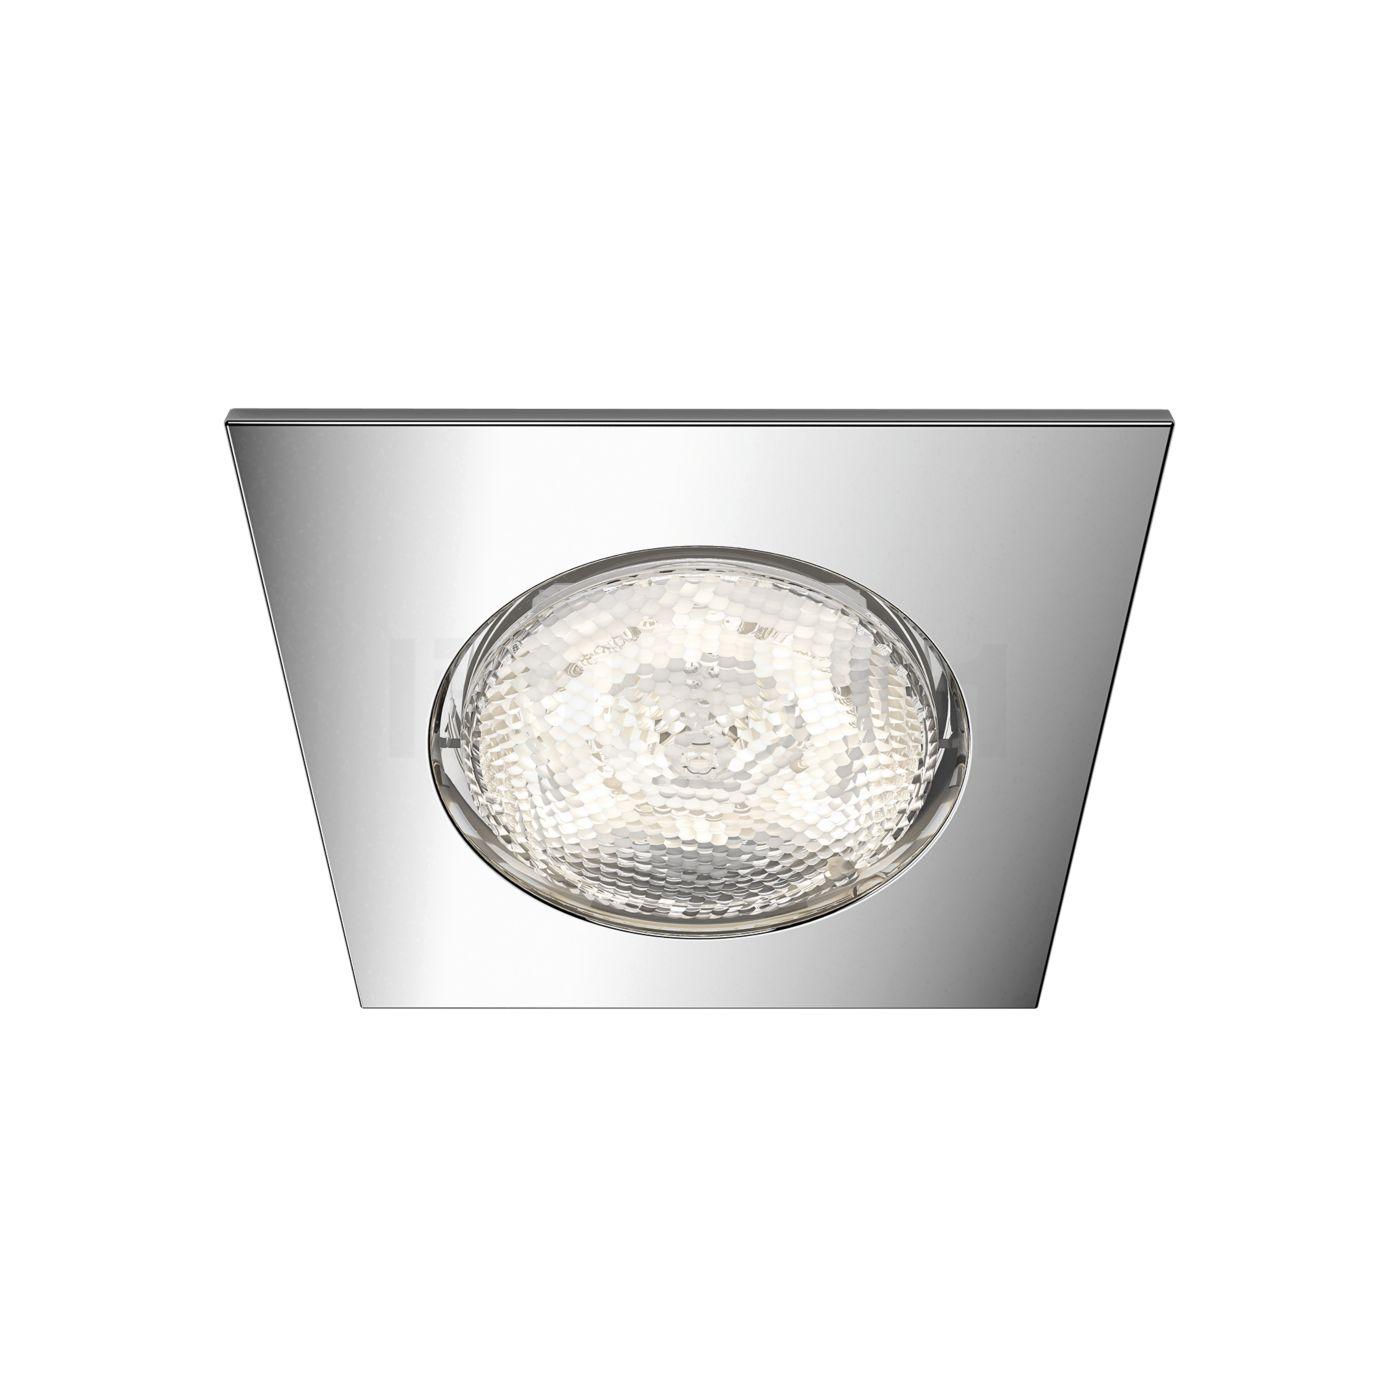 philips mybathroom recessed spot dreaminess angular led spotlights. Black Bedroom Furniture Sets. Home Design Ideas